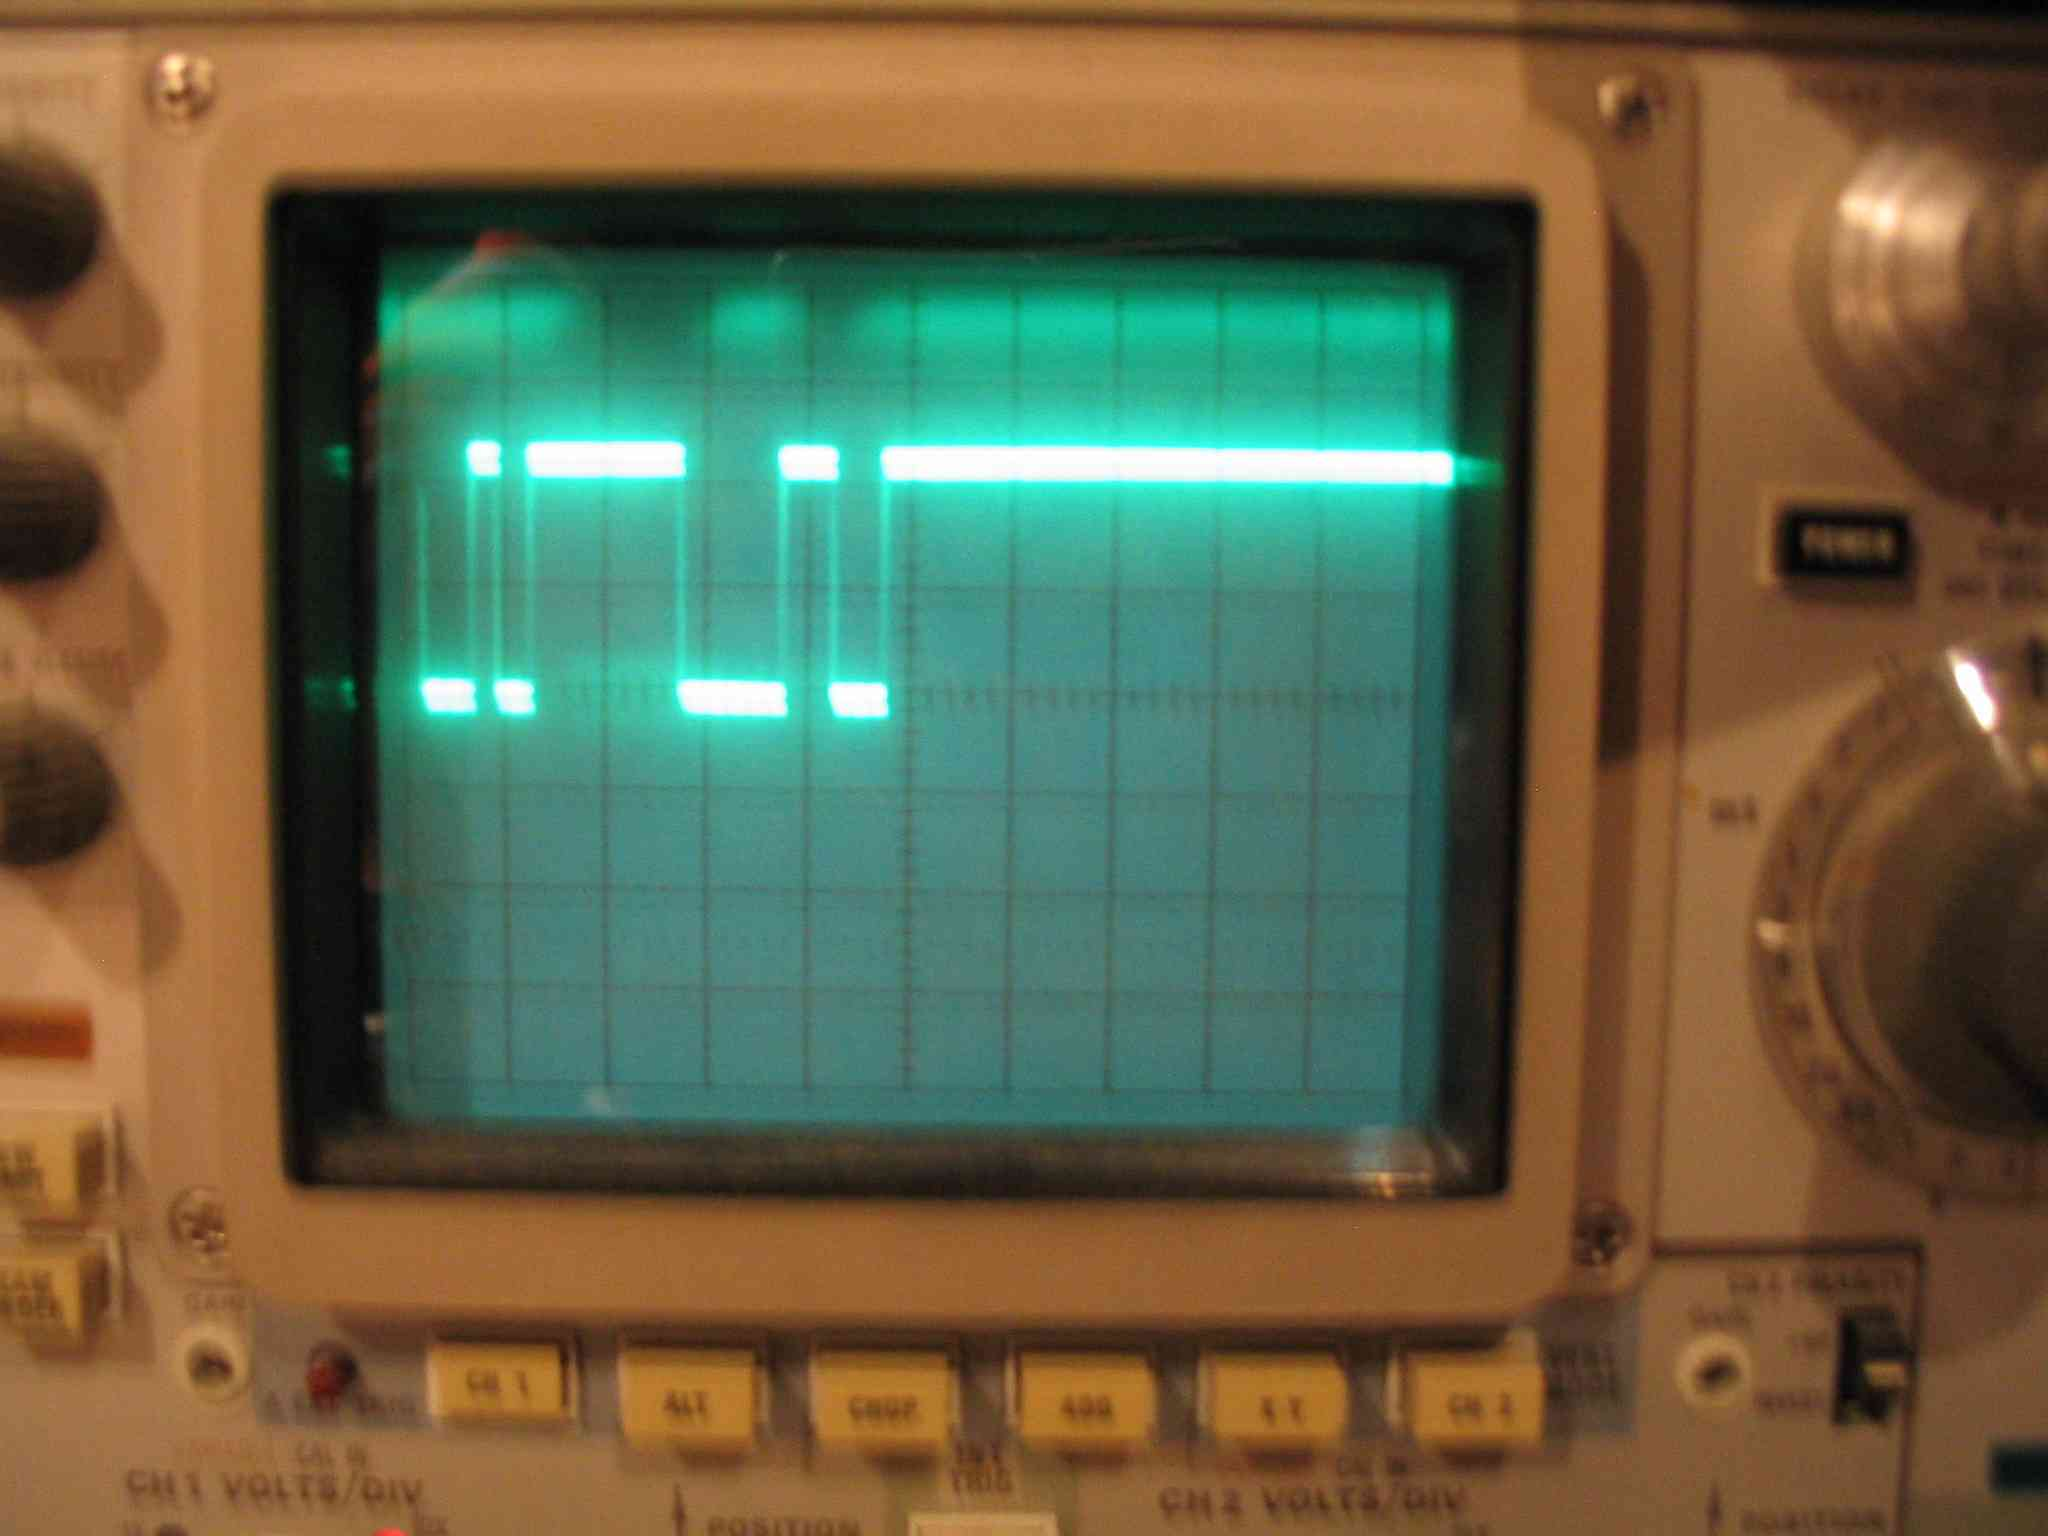 Ultraschall Entfernungsmessung Formel : Ultraschall entfernungsmesser mit i c eigenbau mikrocontroller